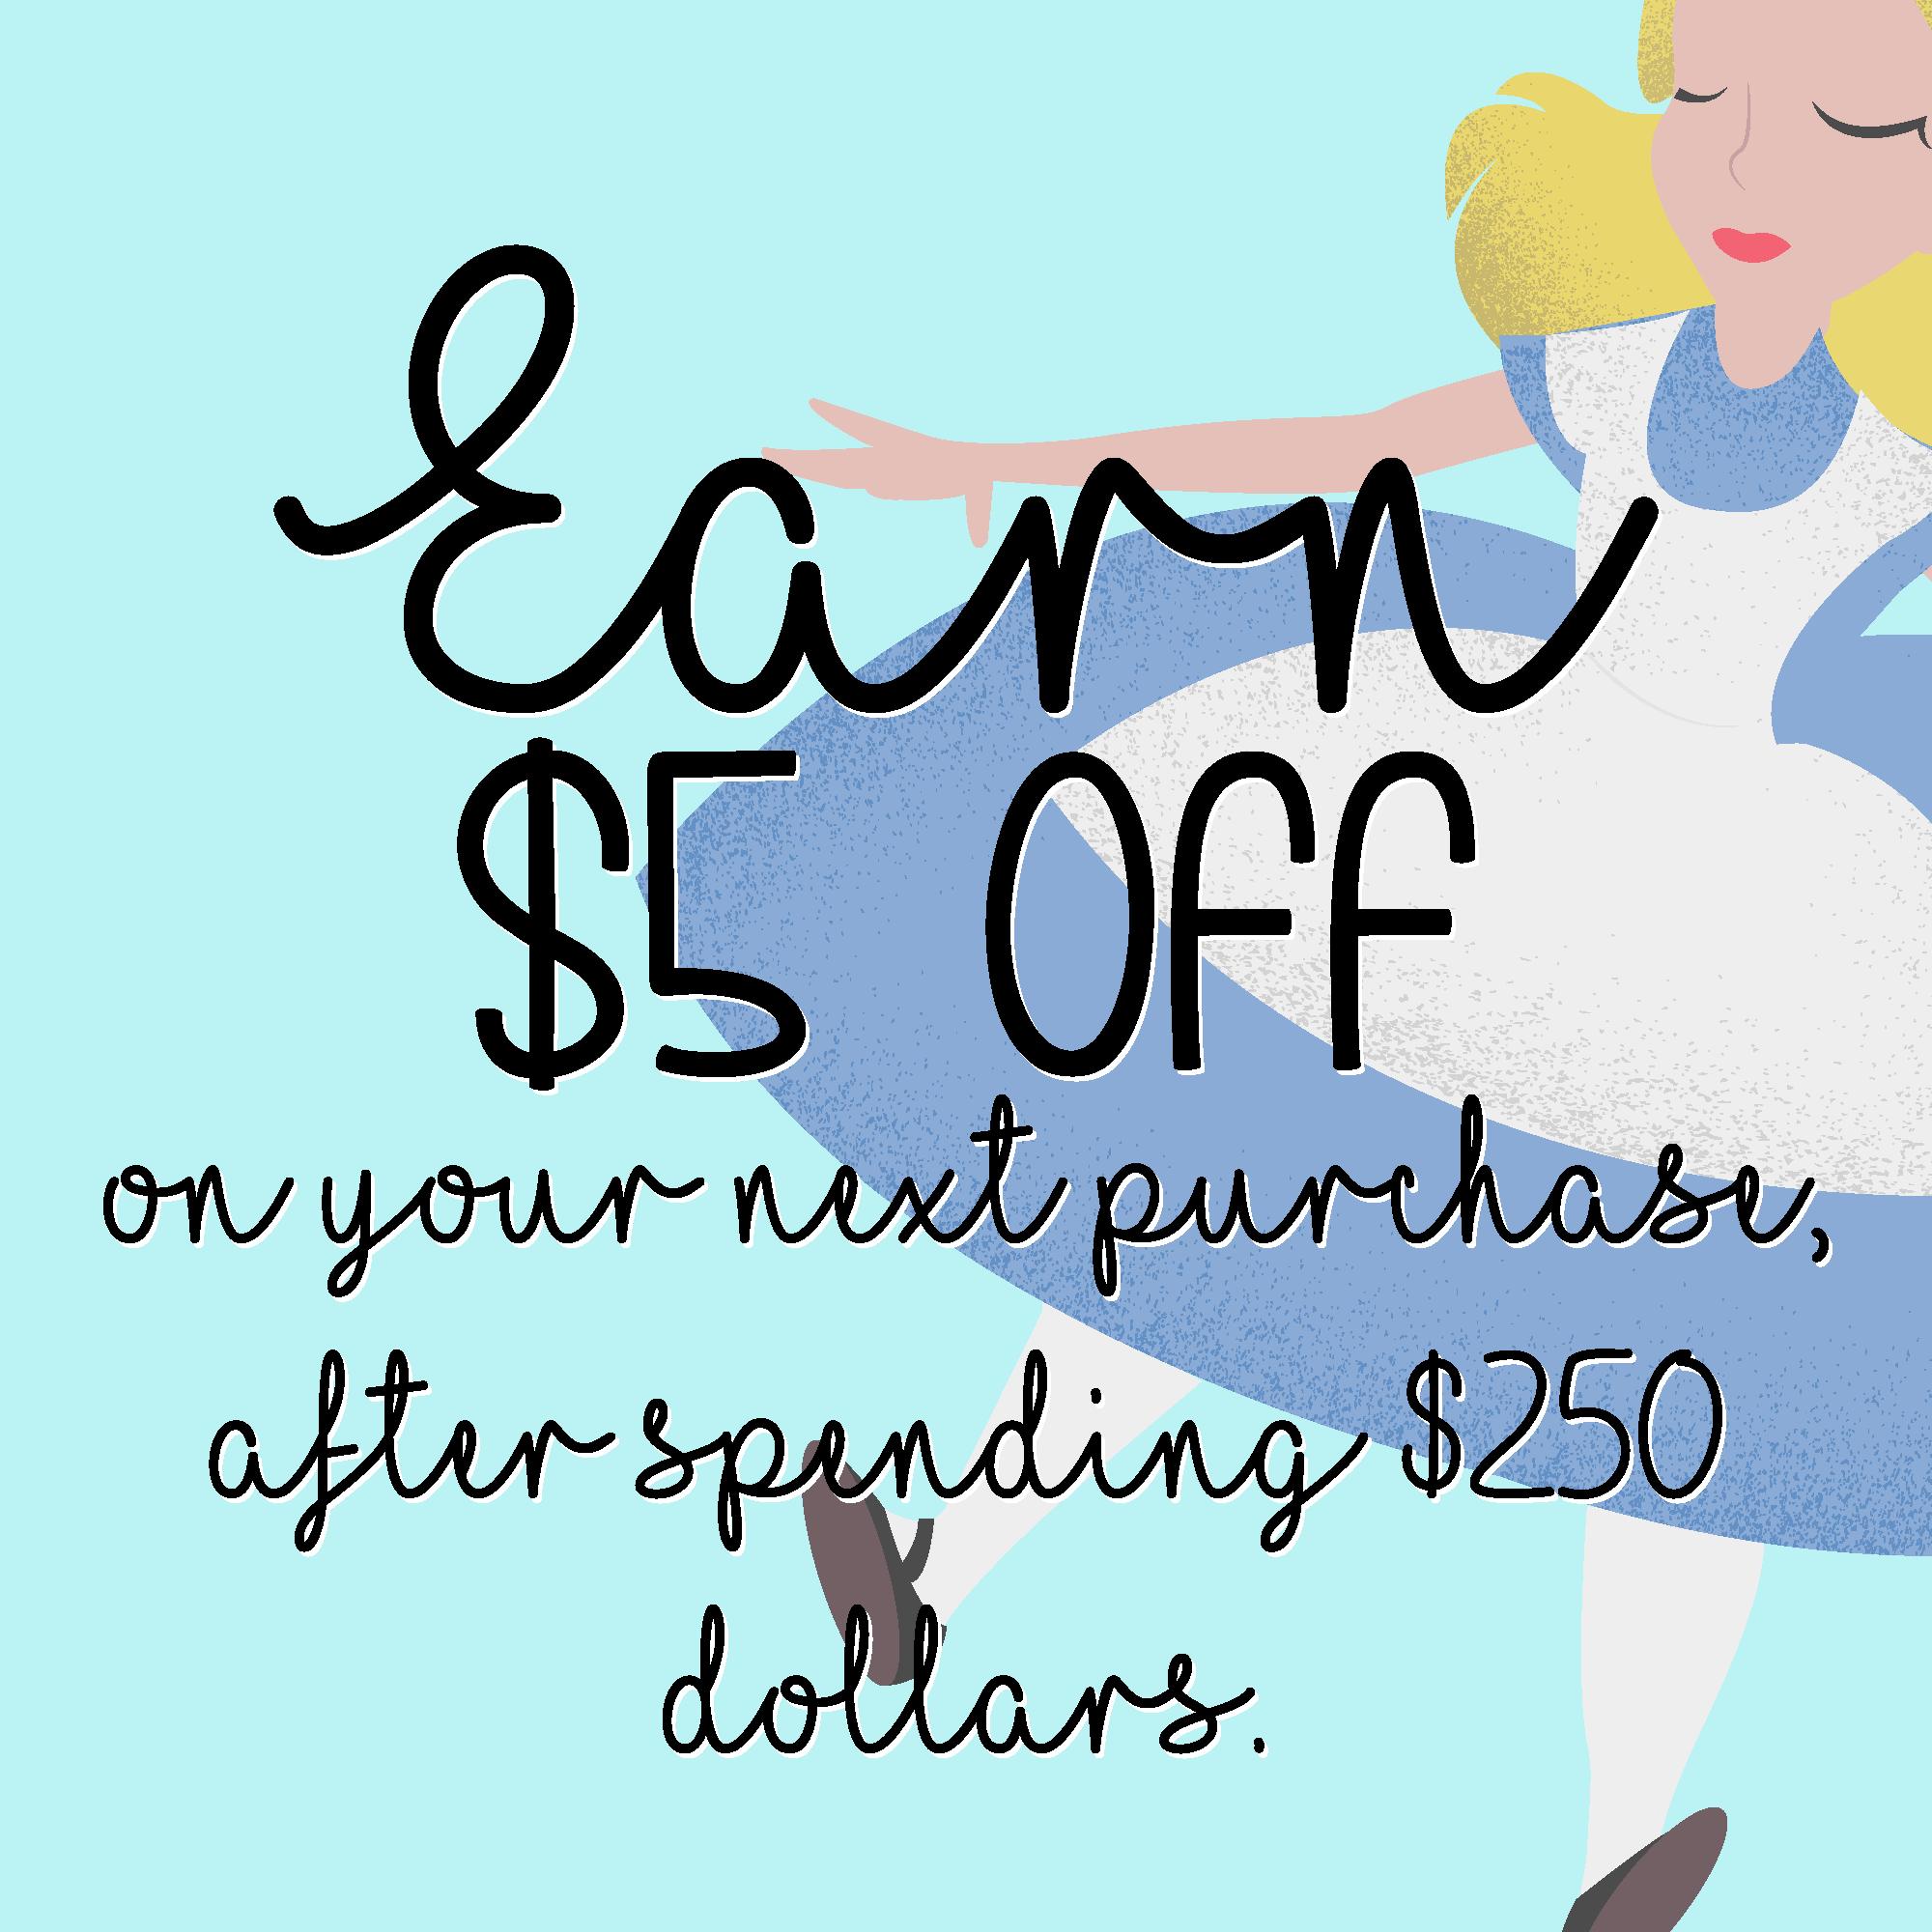 Rewards-Program-5-dollar.png